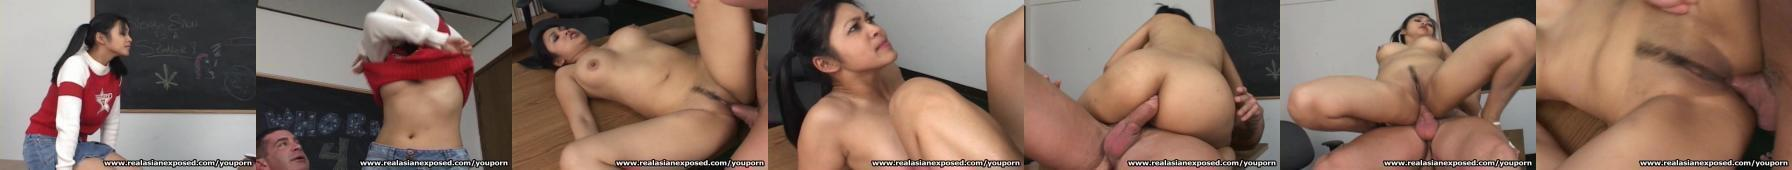 Darmowe chude azjatyckie porno